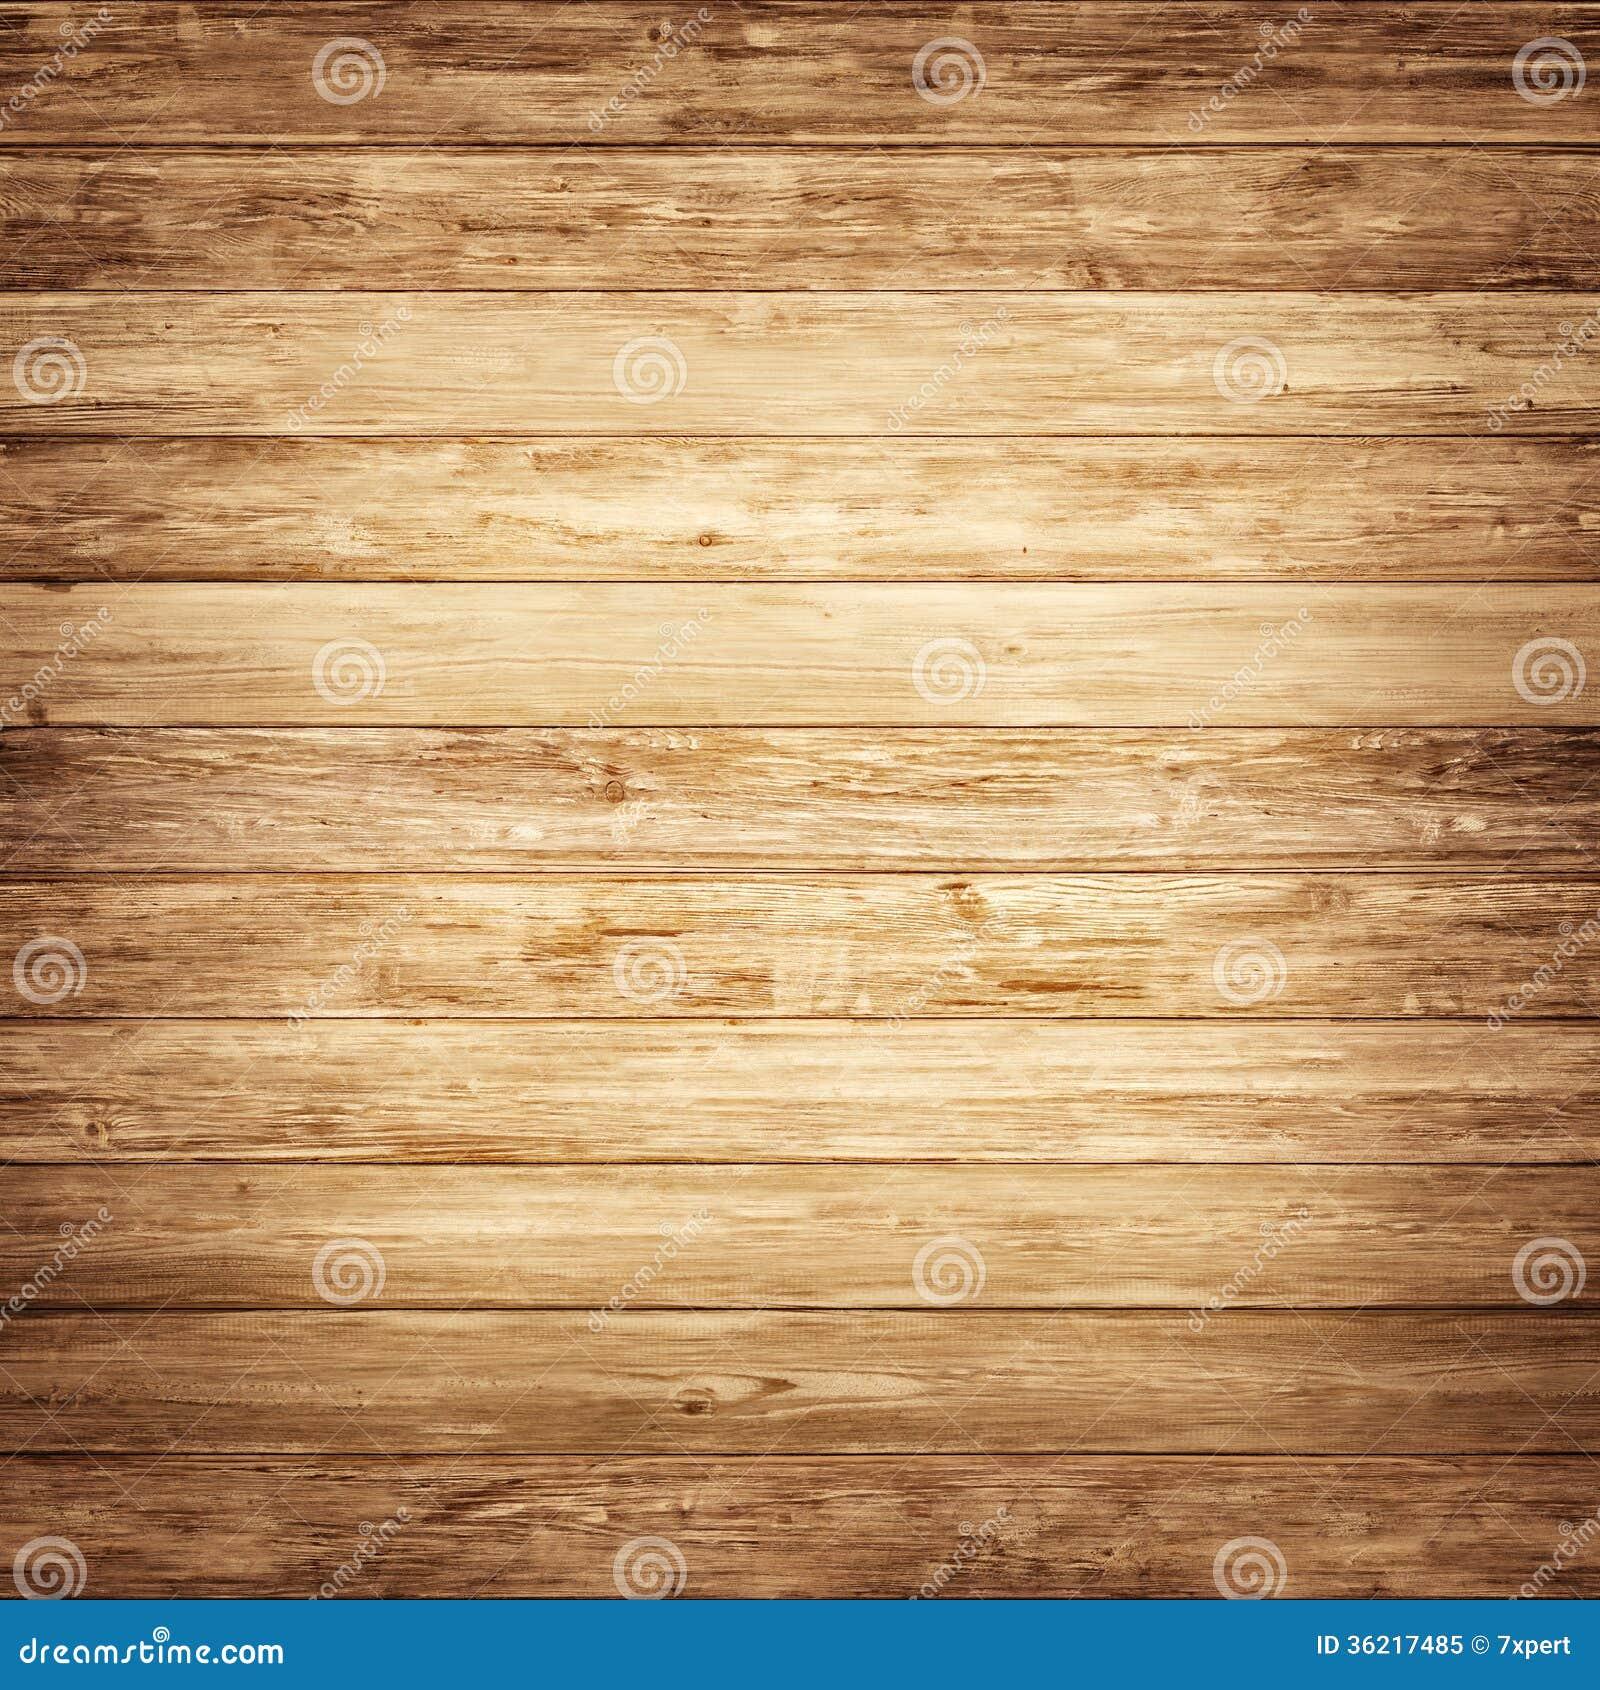 Wood Parquet Background Royalty Free Stock Photo Image